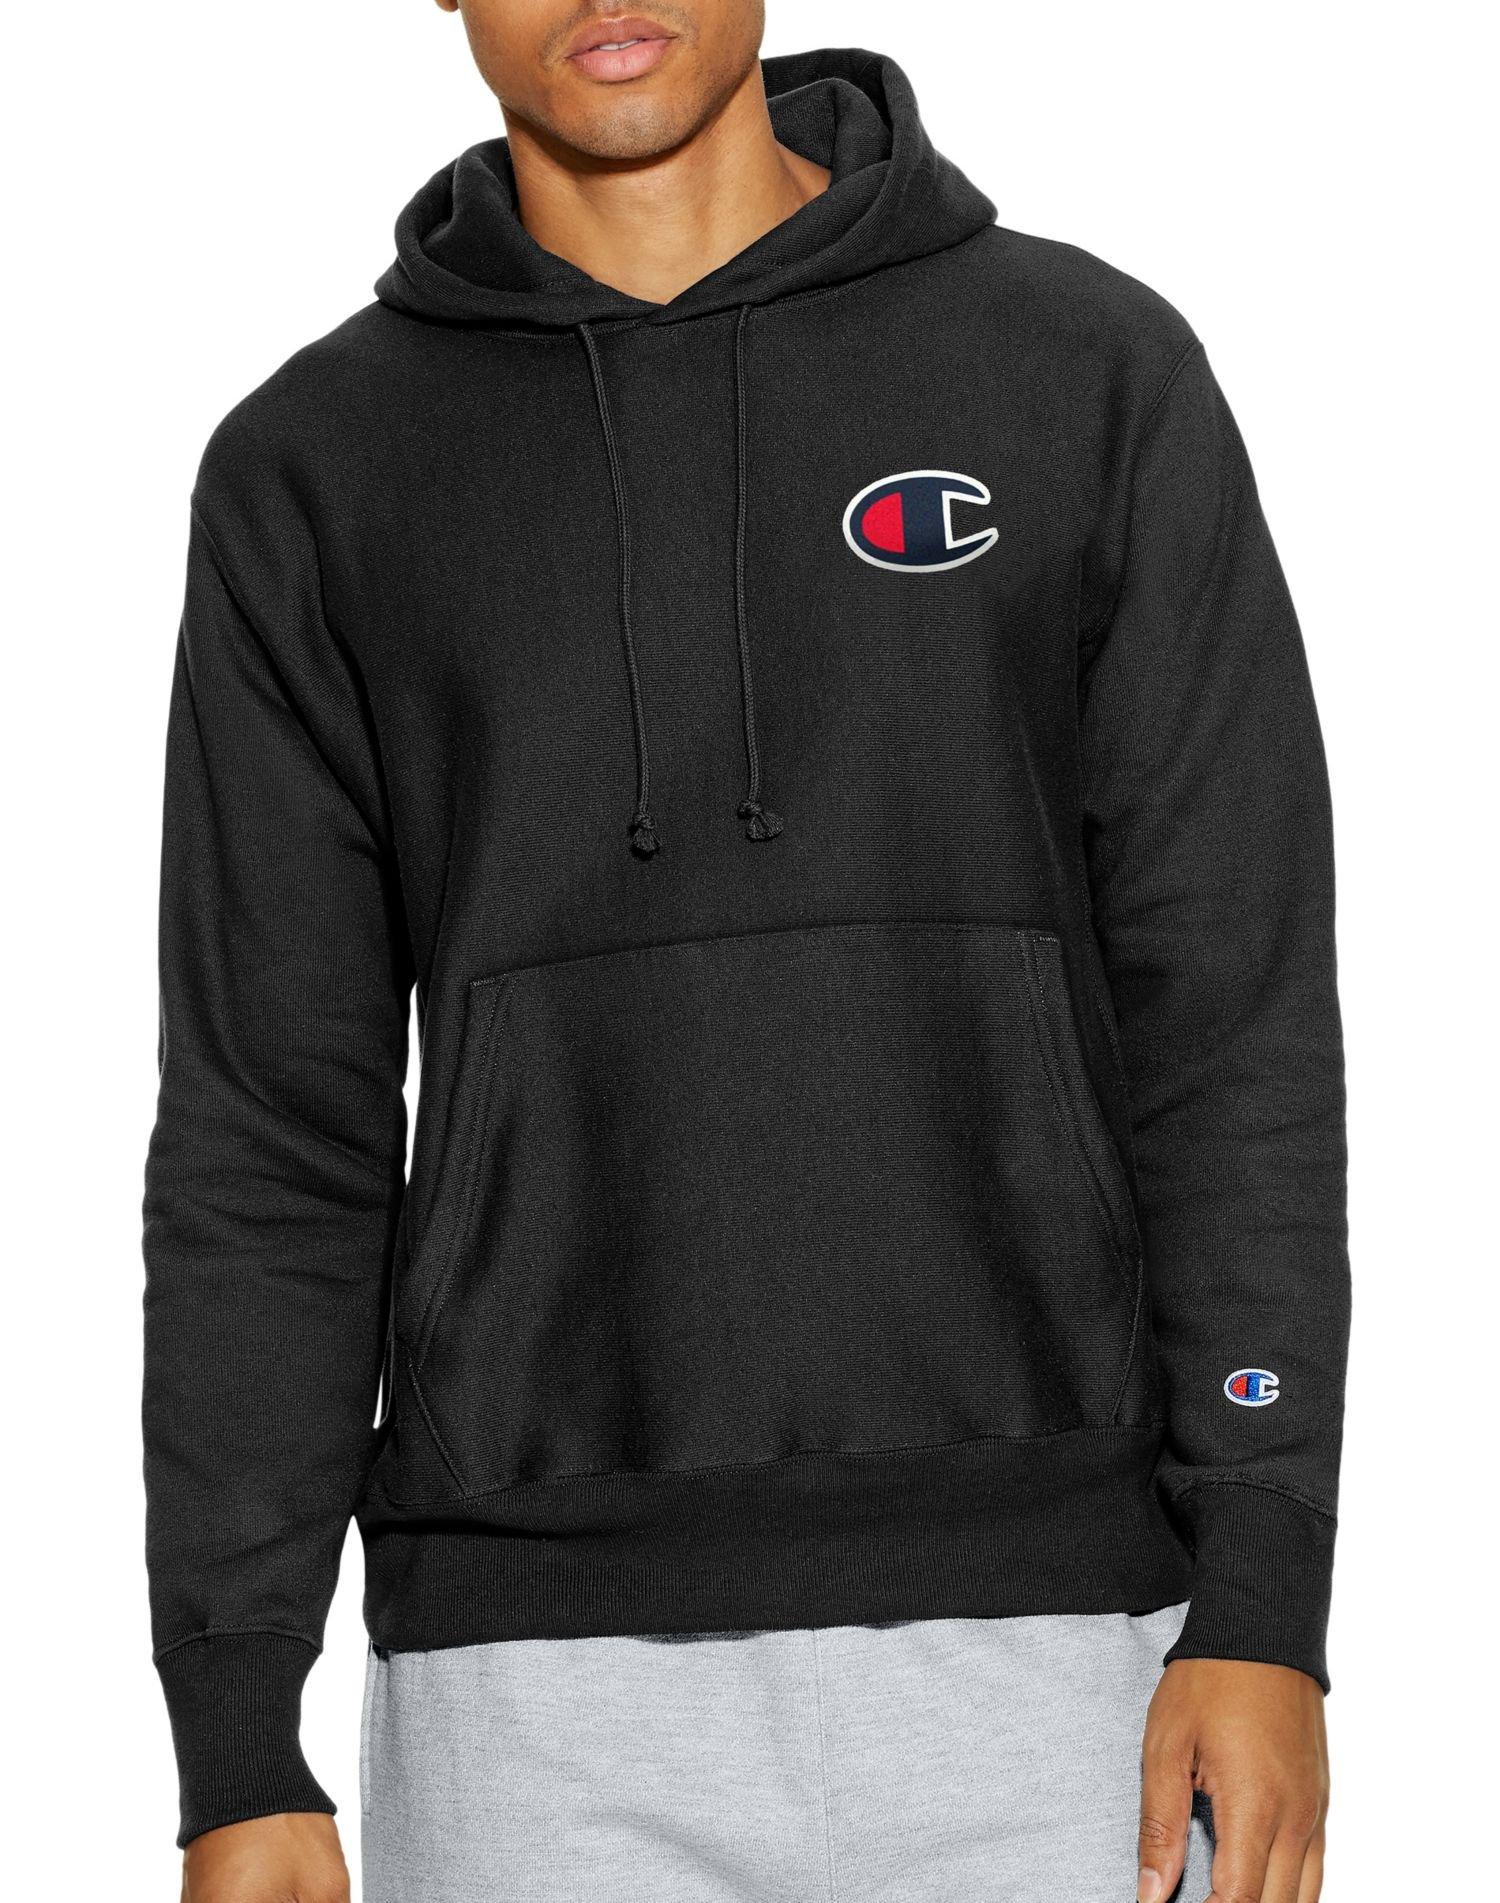 Champion LIFE Men's Reverse Weave Pullover Hoodie, Black/Big C Left Chest, X Large